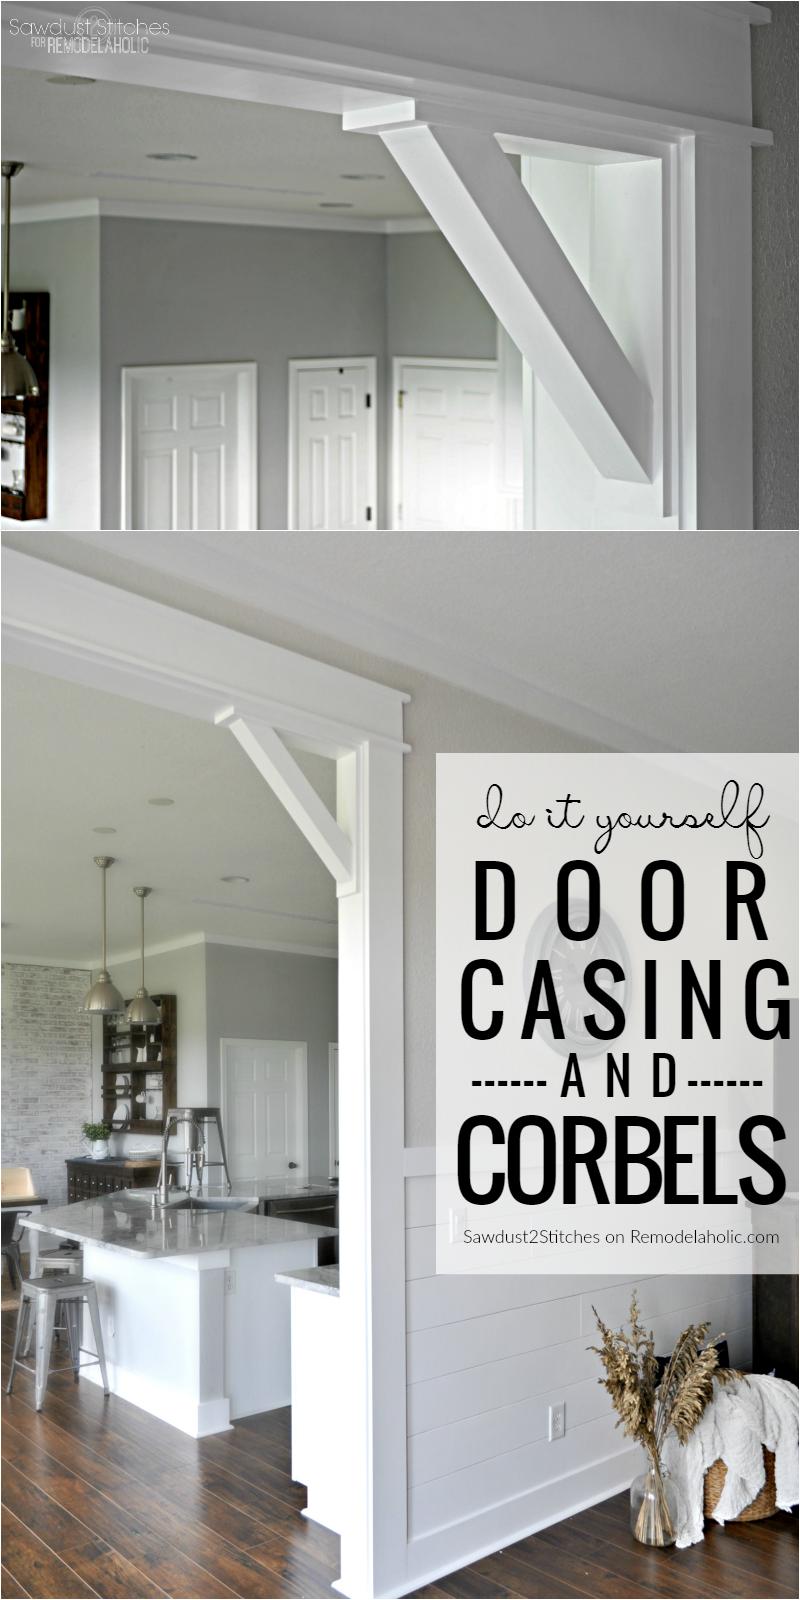 Diy Door Casing And Easy Corbels Tutorial @Remodelaholic | Blogger ...